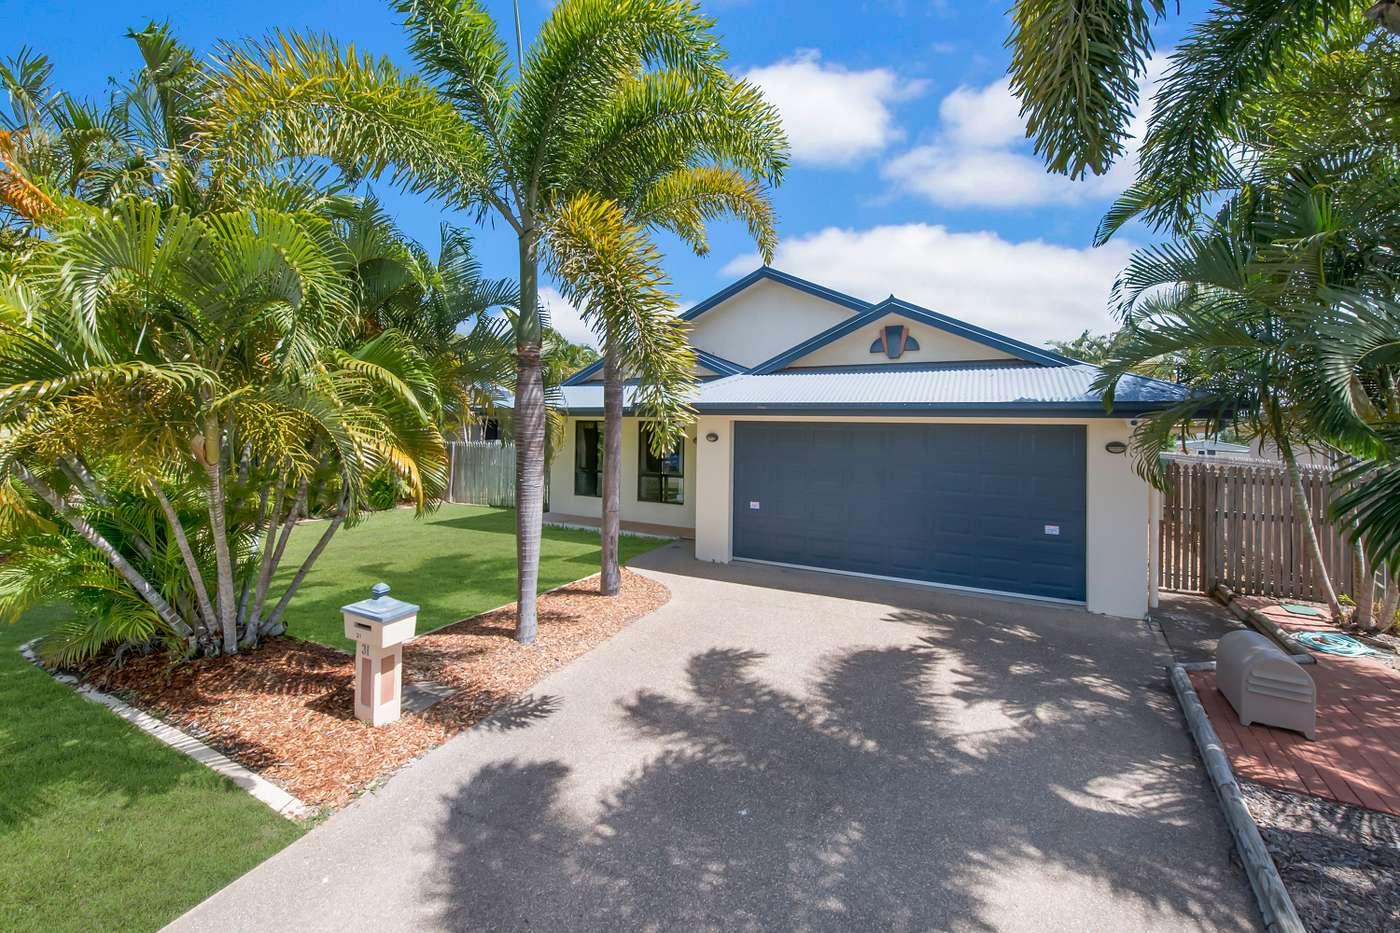 Main view of Homely house listing, 31 Lakewood Avenue, Kirwan, QLD 4817